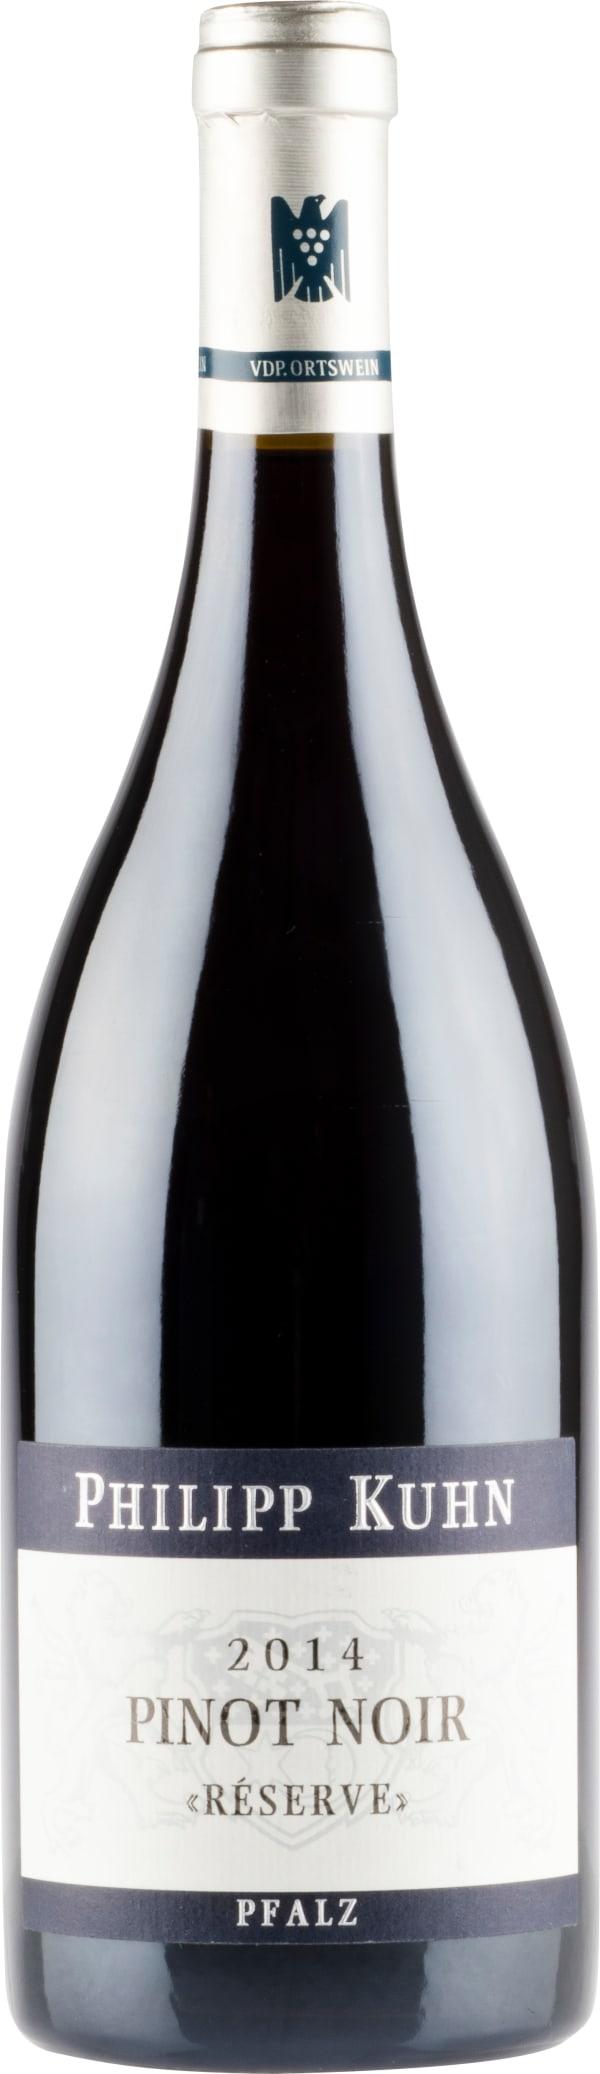 Philipp Kuhn Pinot Noir Laumersheimer Réserve 2014